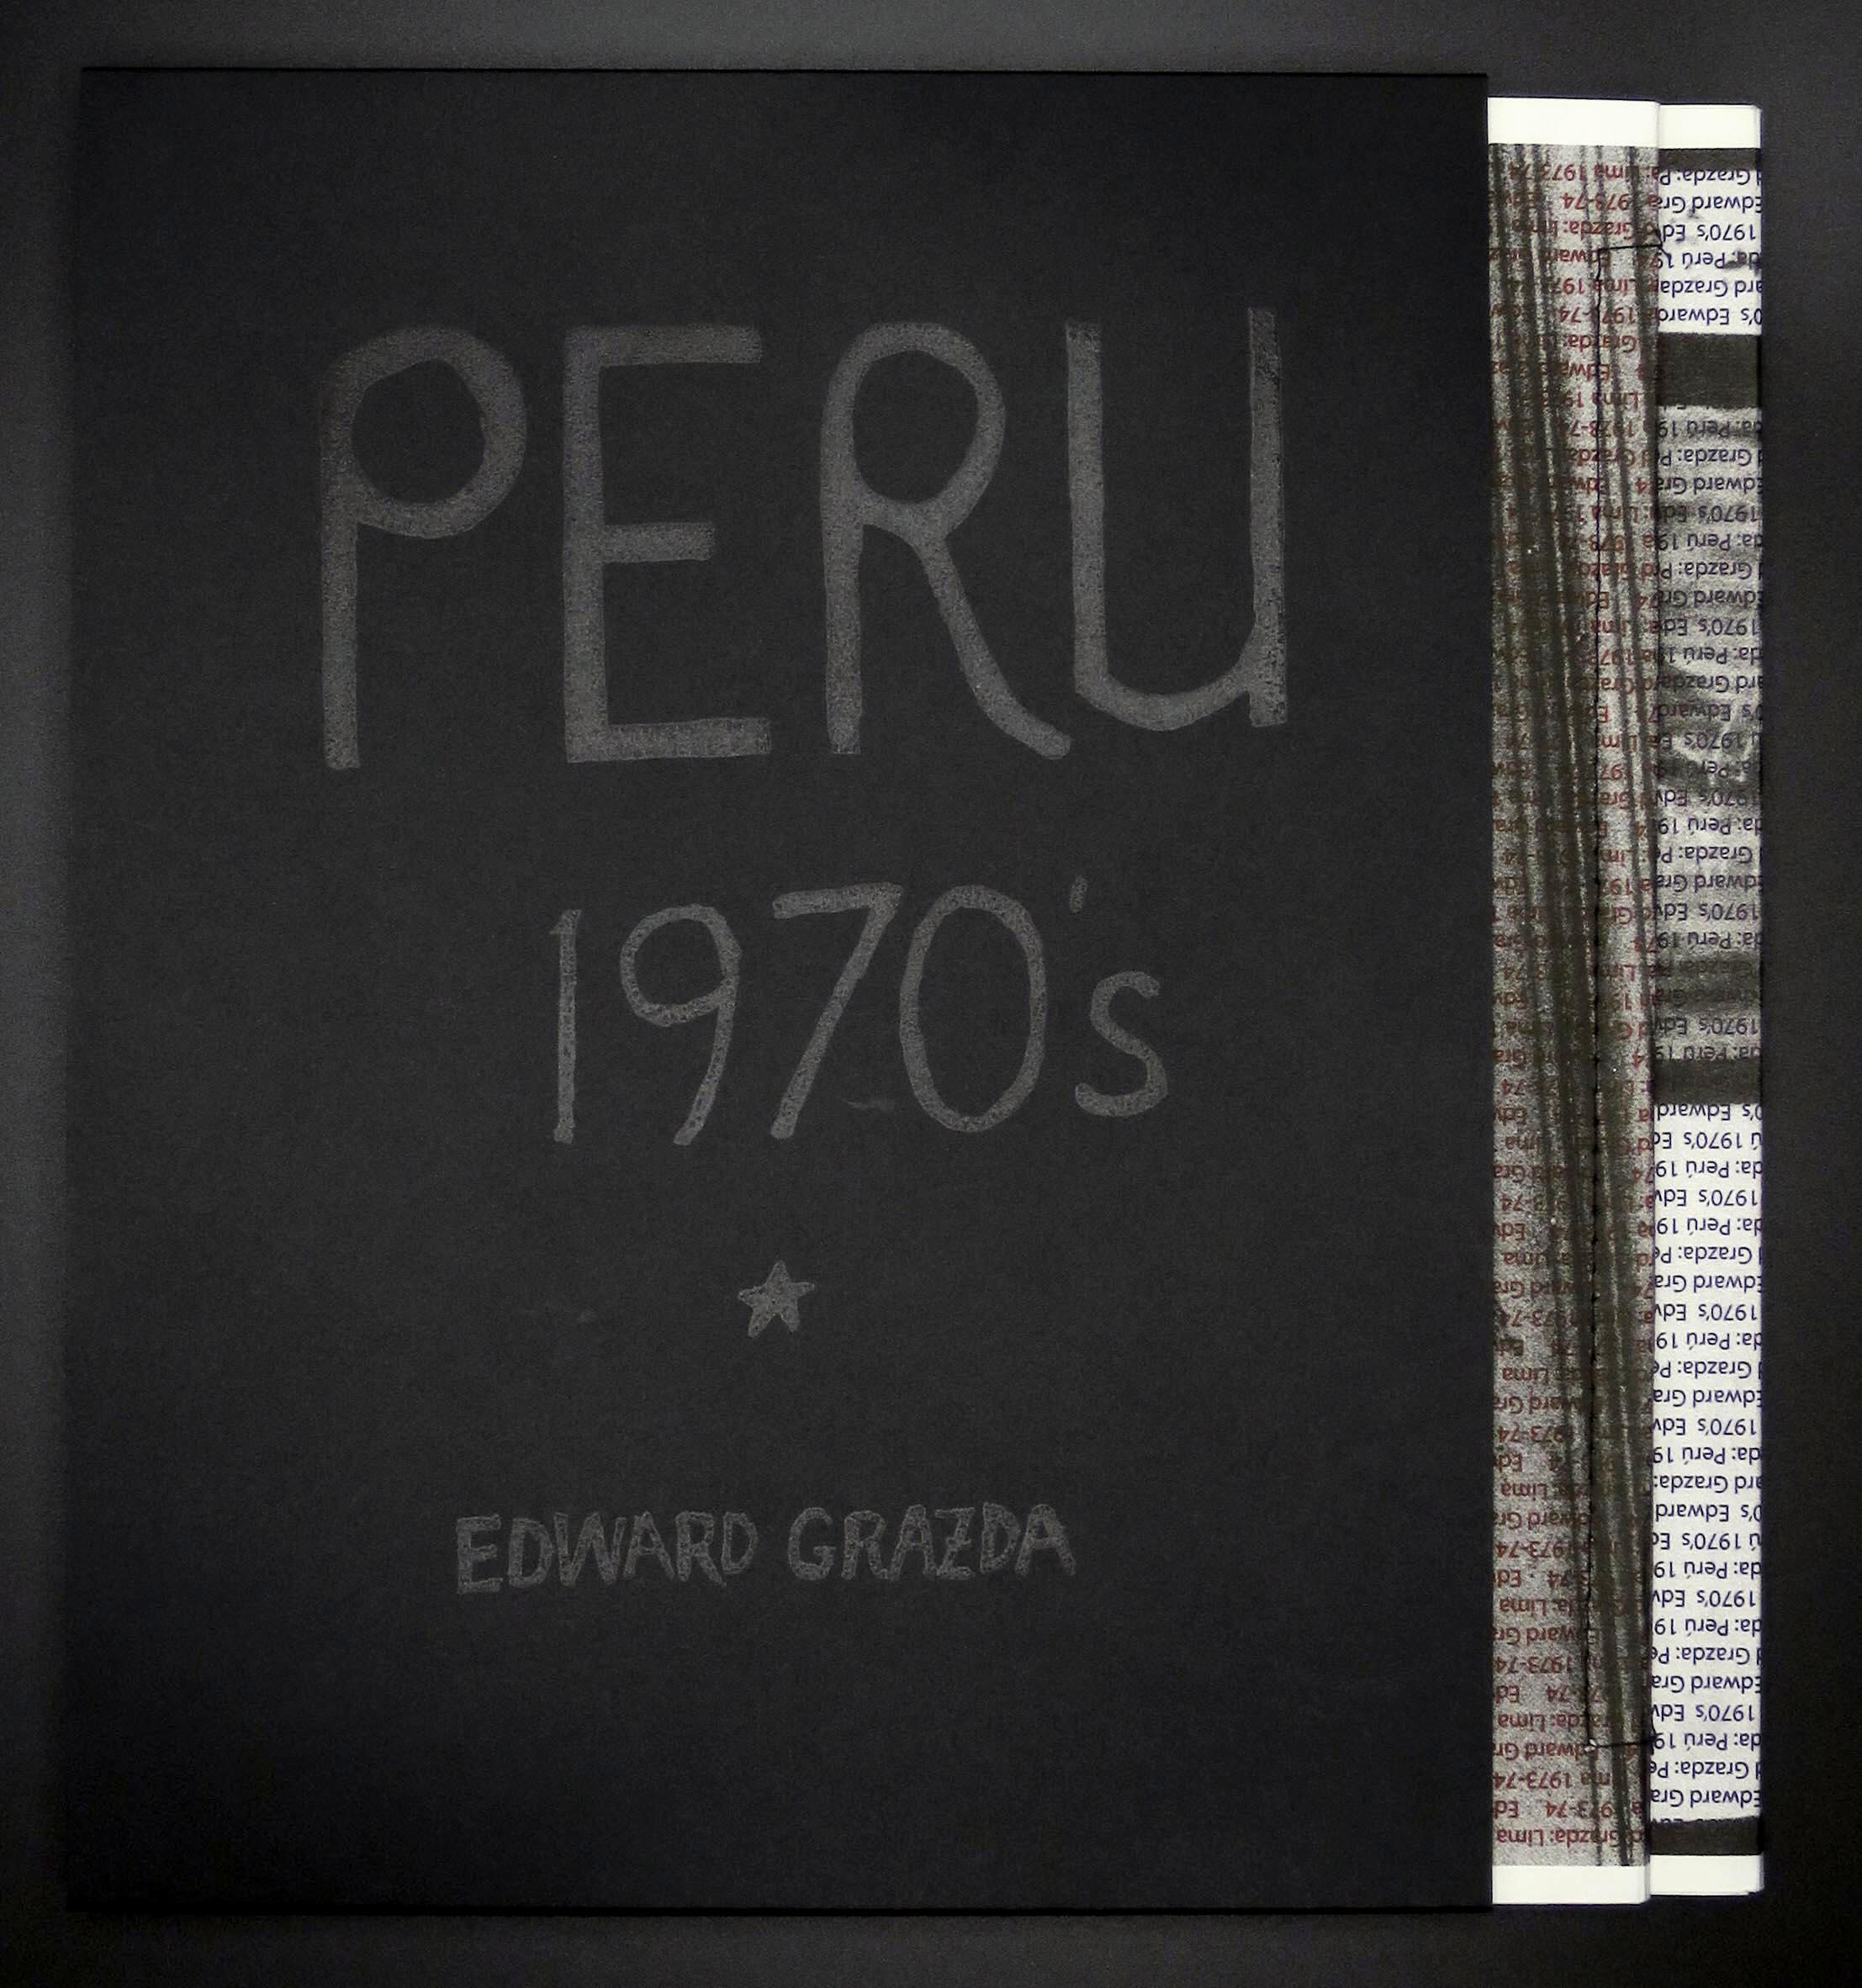 Ed_Peru-1.2.jpg